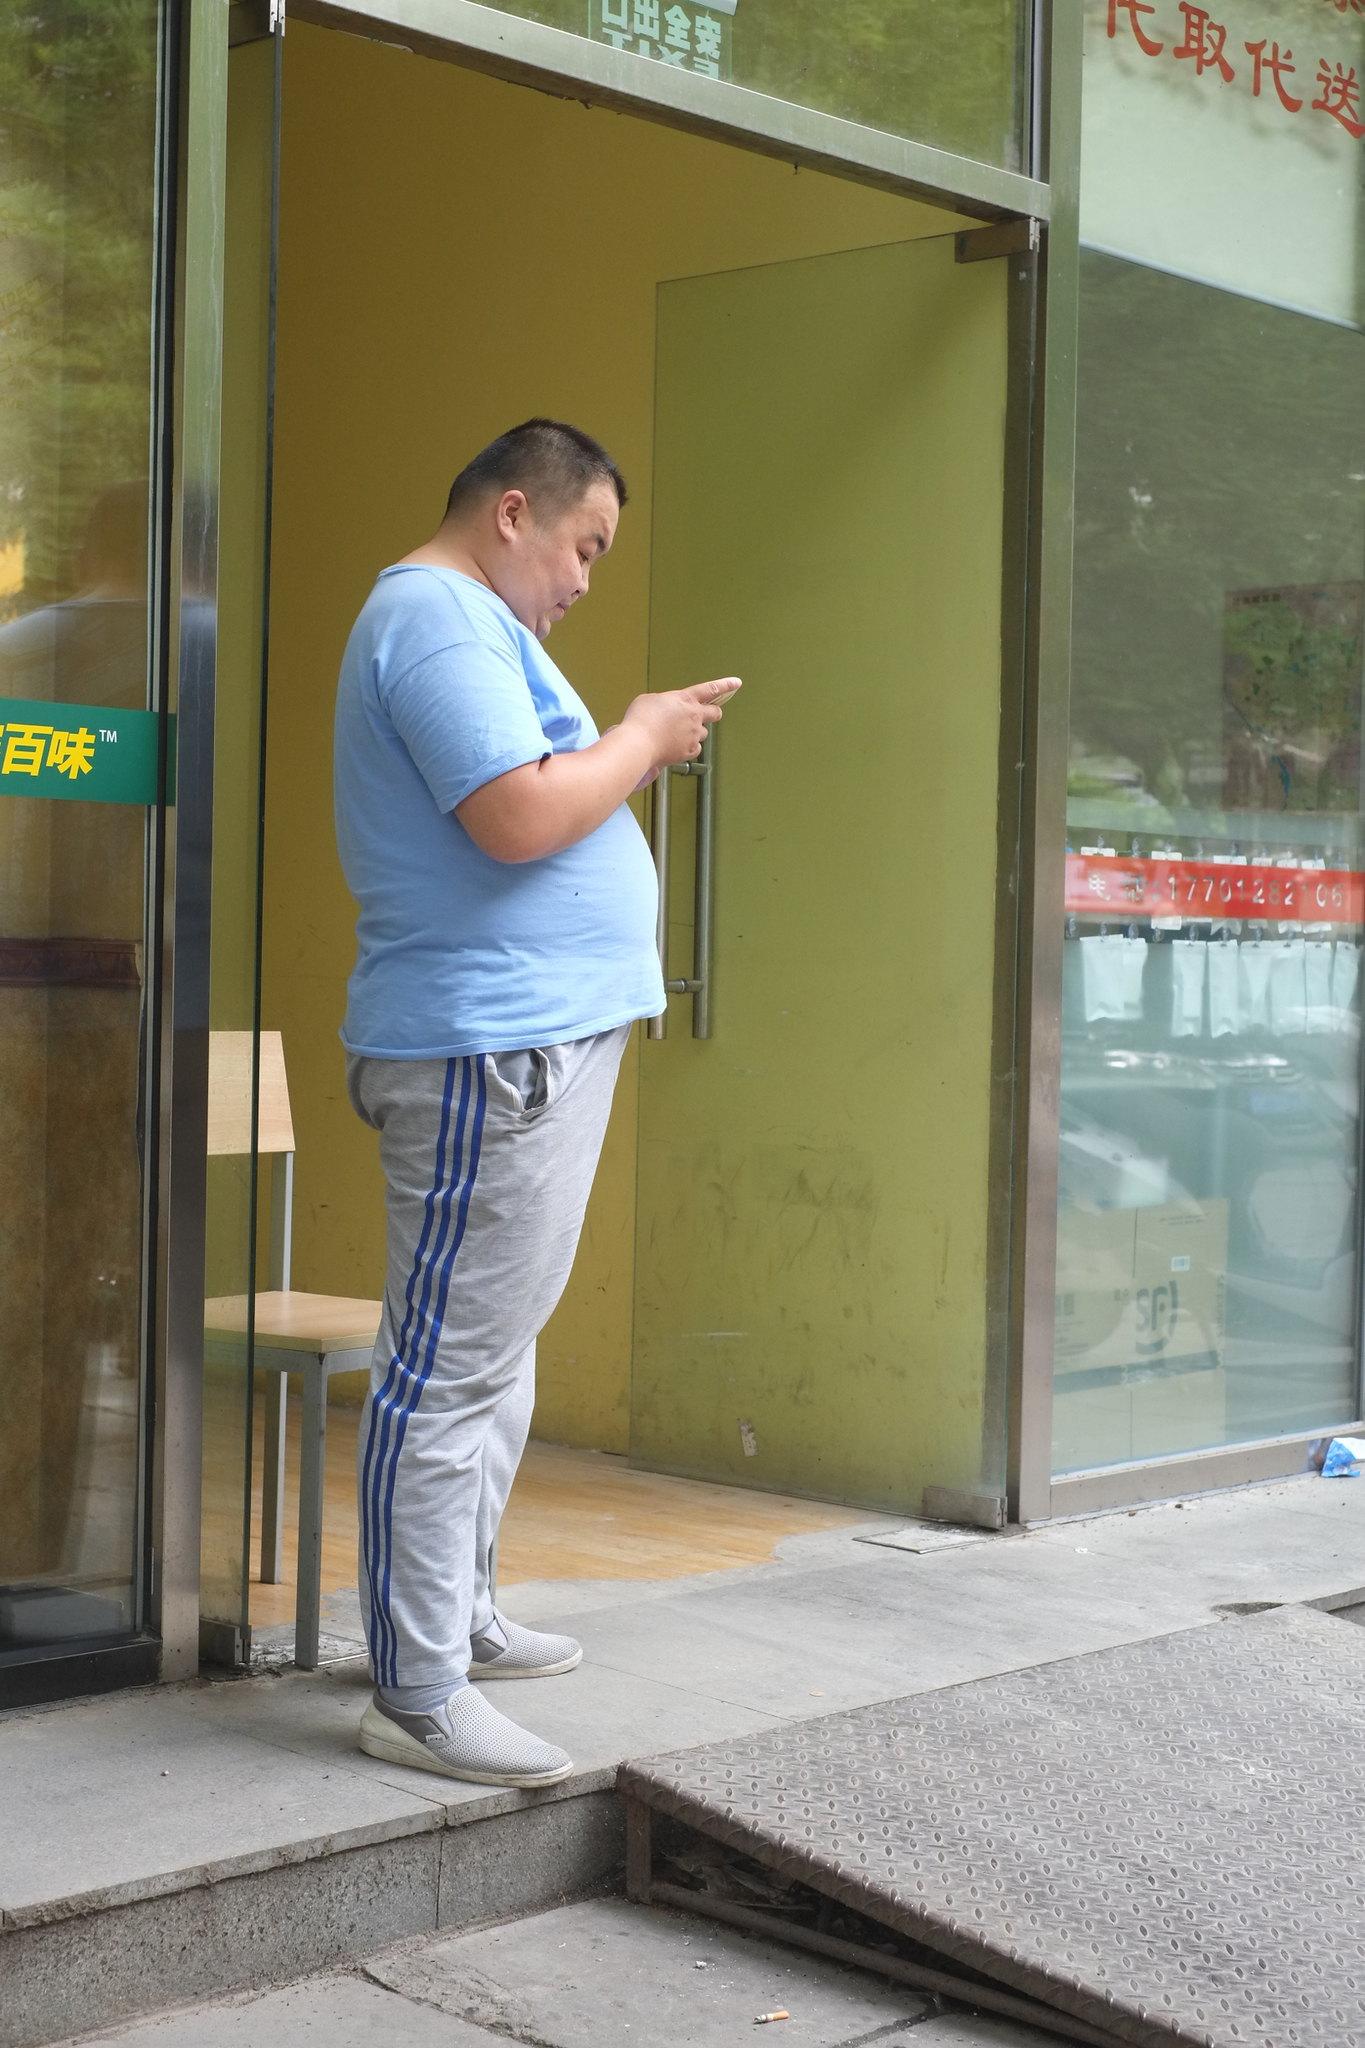 Mobile or no mobile